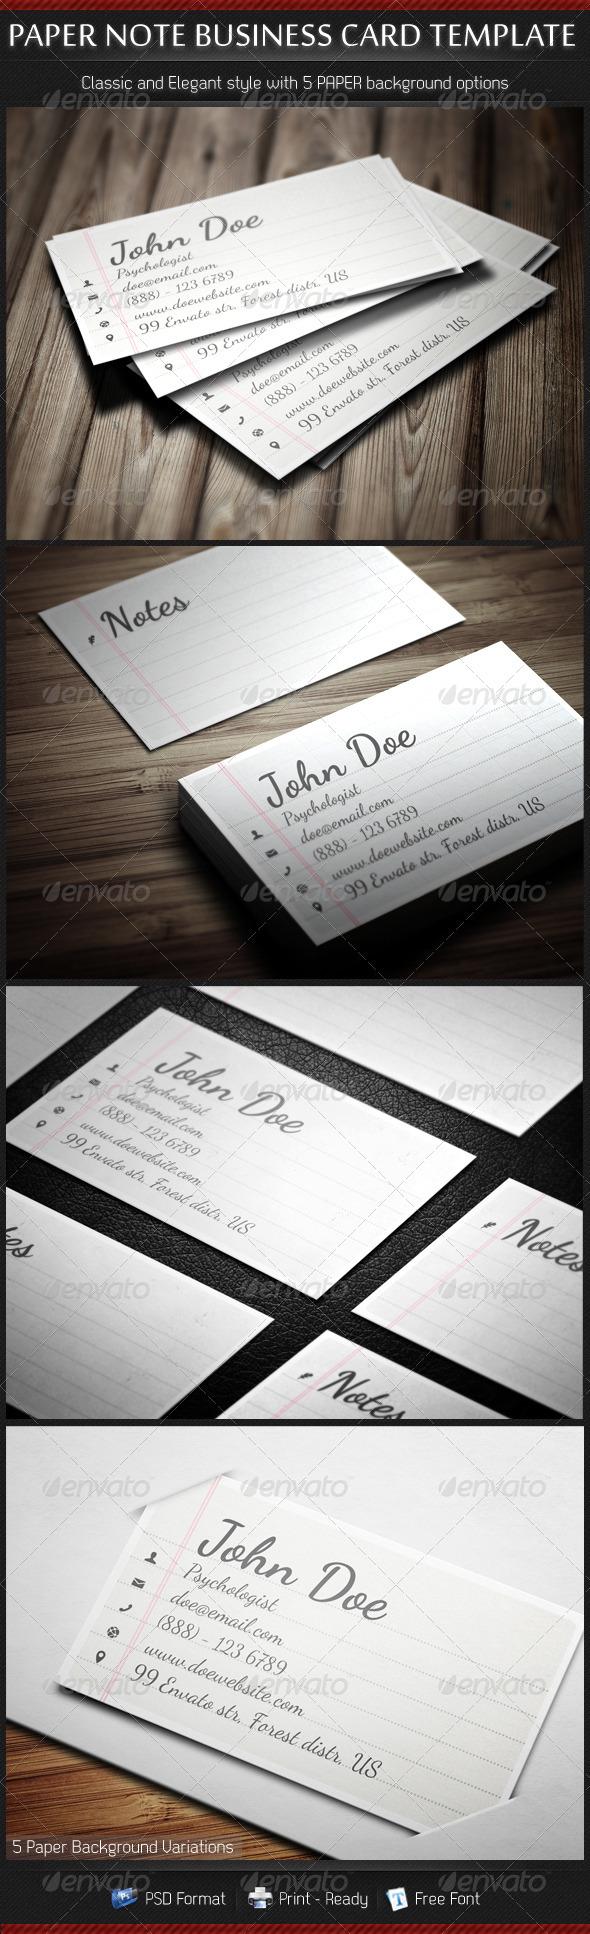 Paper Note Handscript Creative Business Cards - Retro/Vintage Business Cards